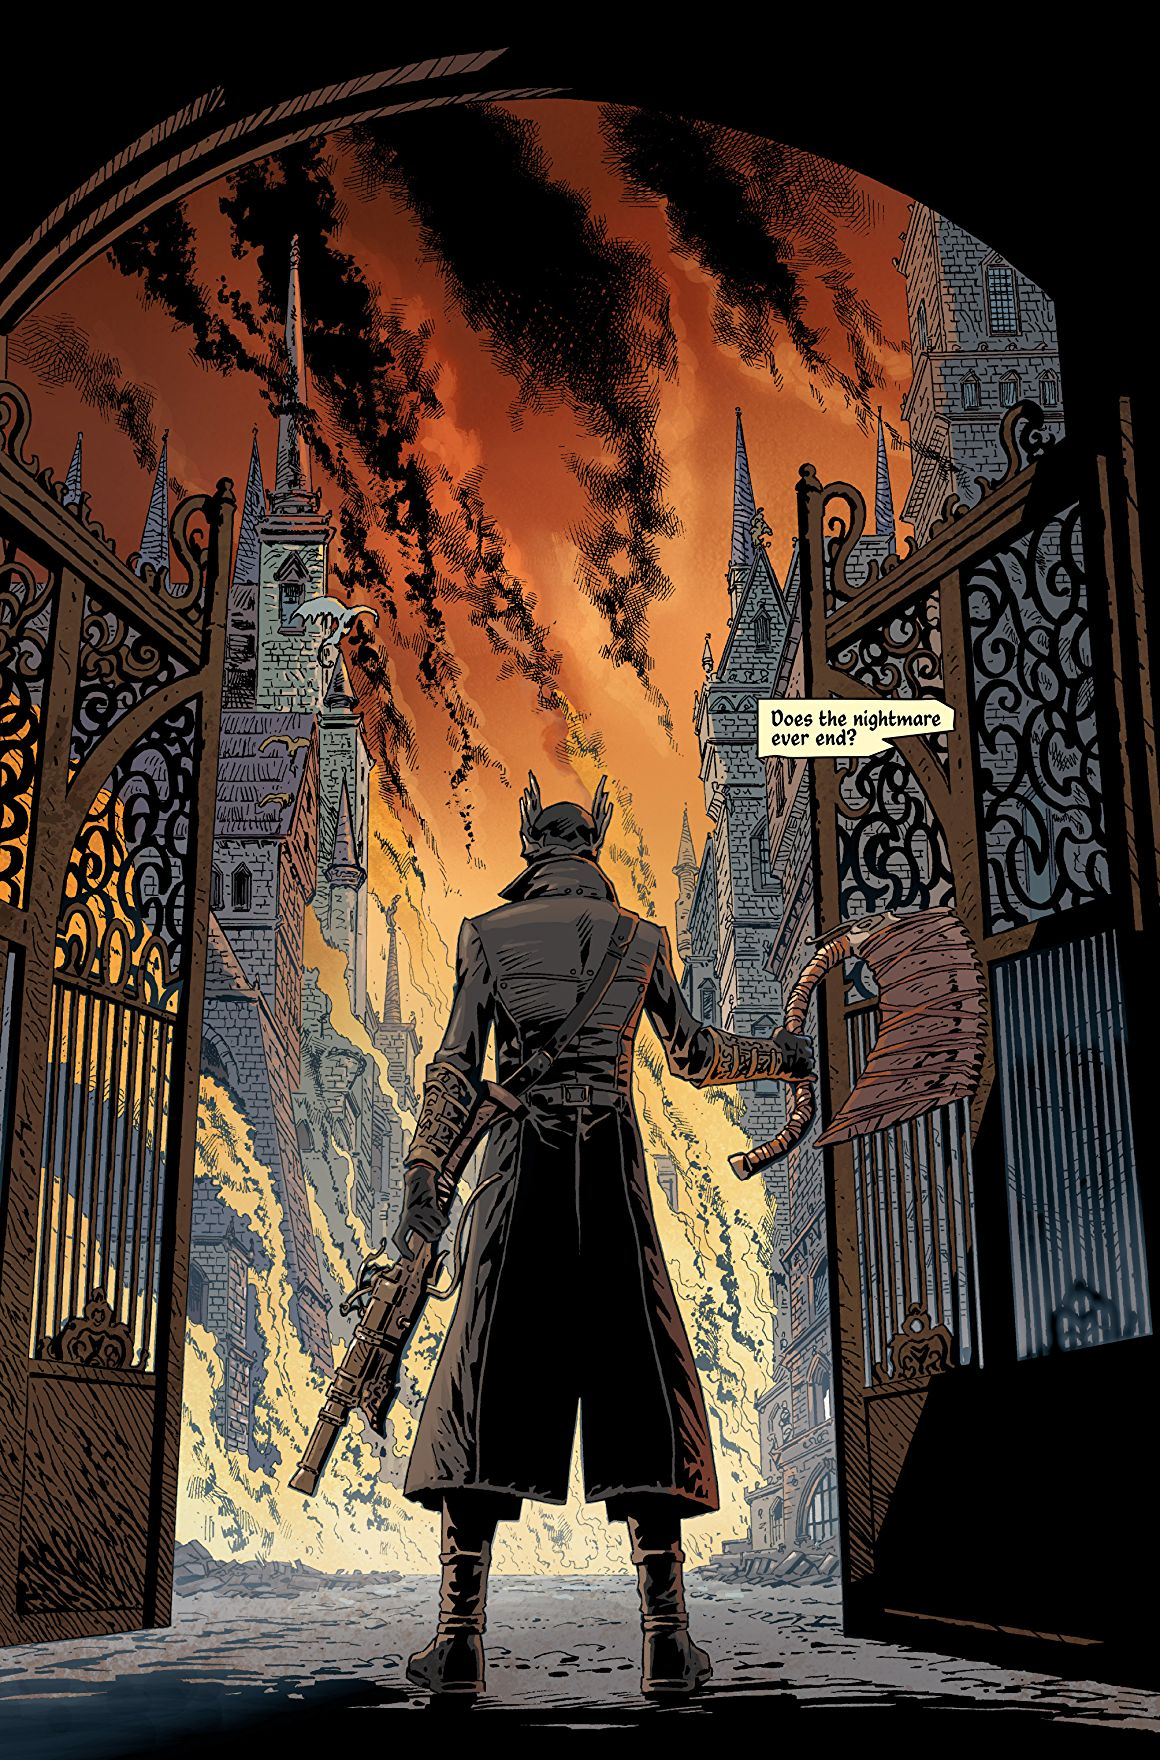 Znalezione obrazy dla zapytania: bloodborne comicbook vol 1